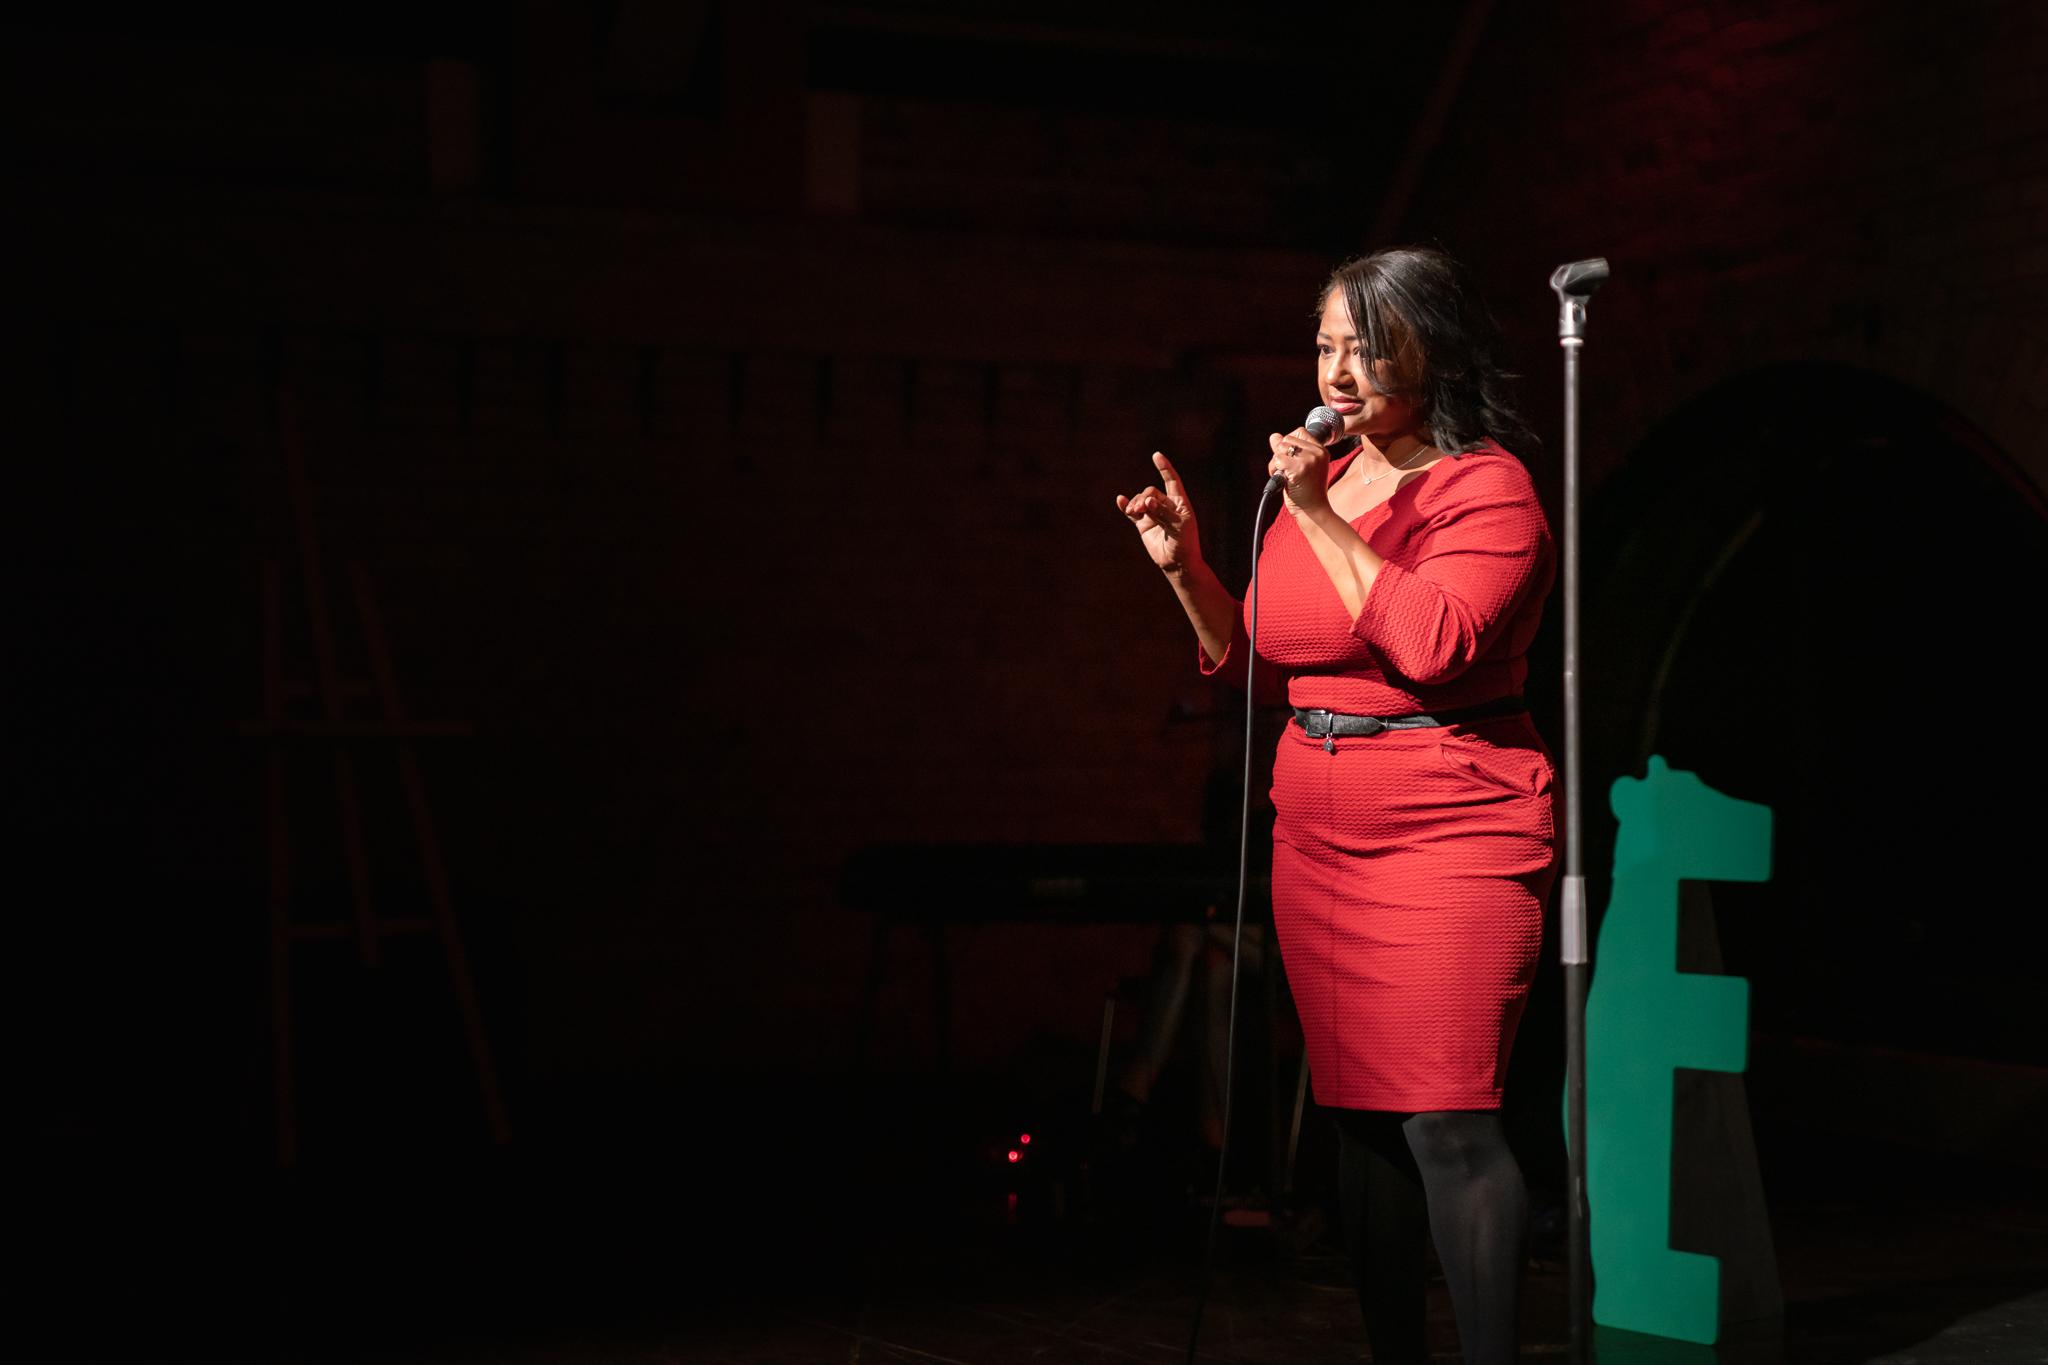 Denise on stage at The Bear, Maschinenhaus im Kulturbrauerei; Photo: Felix Limmer.